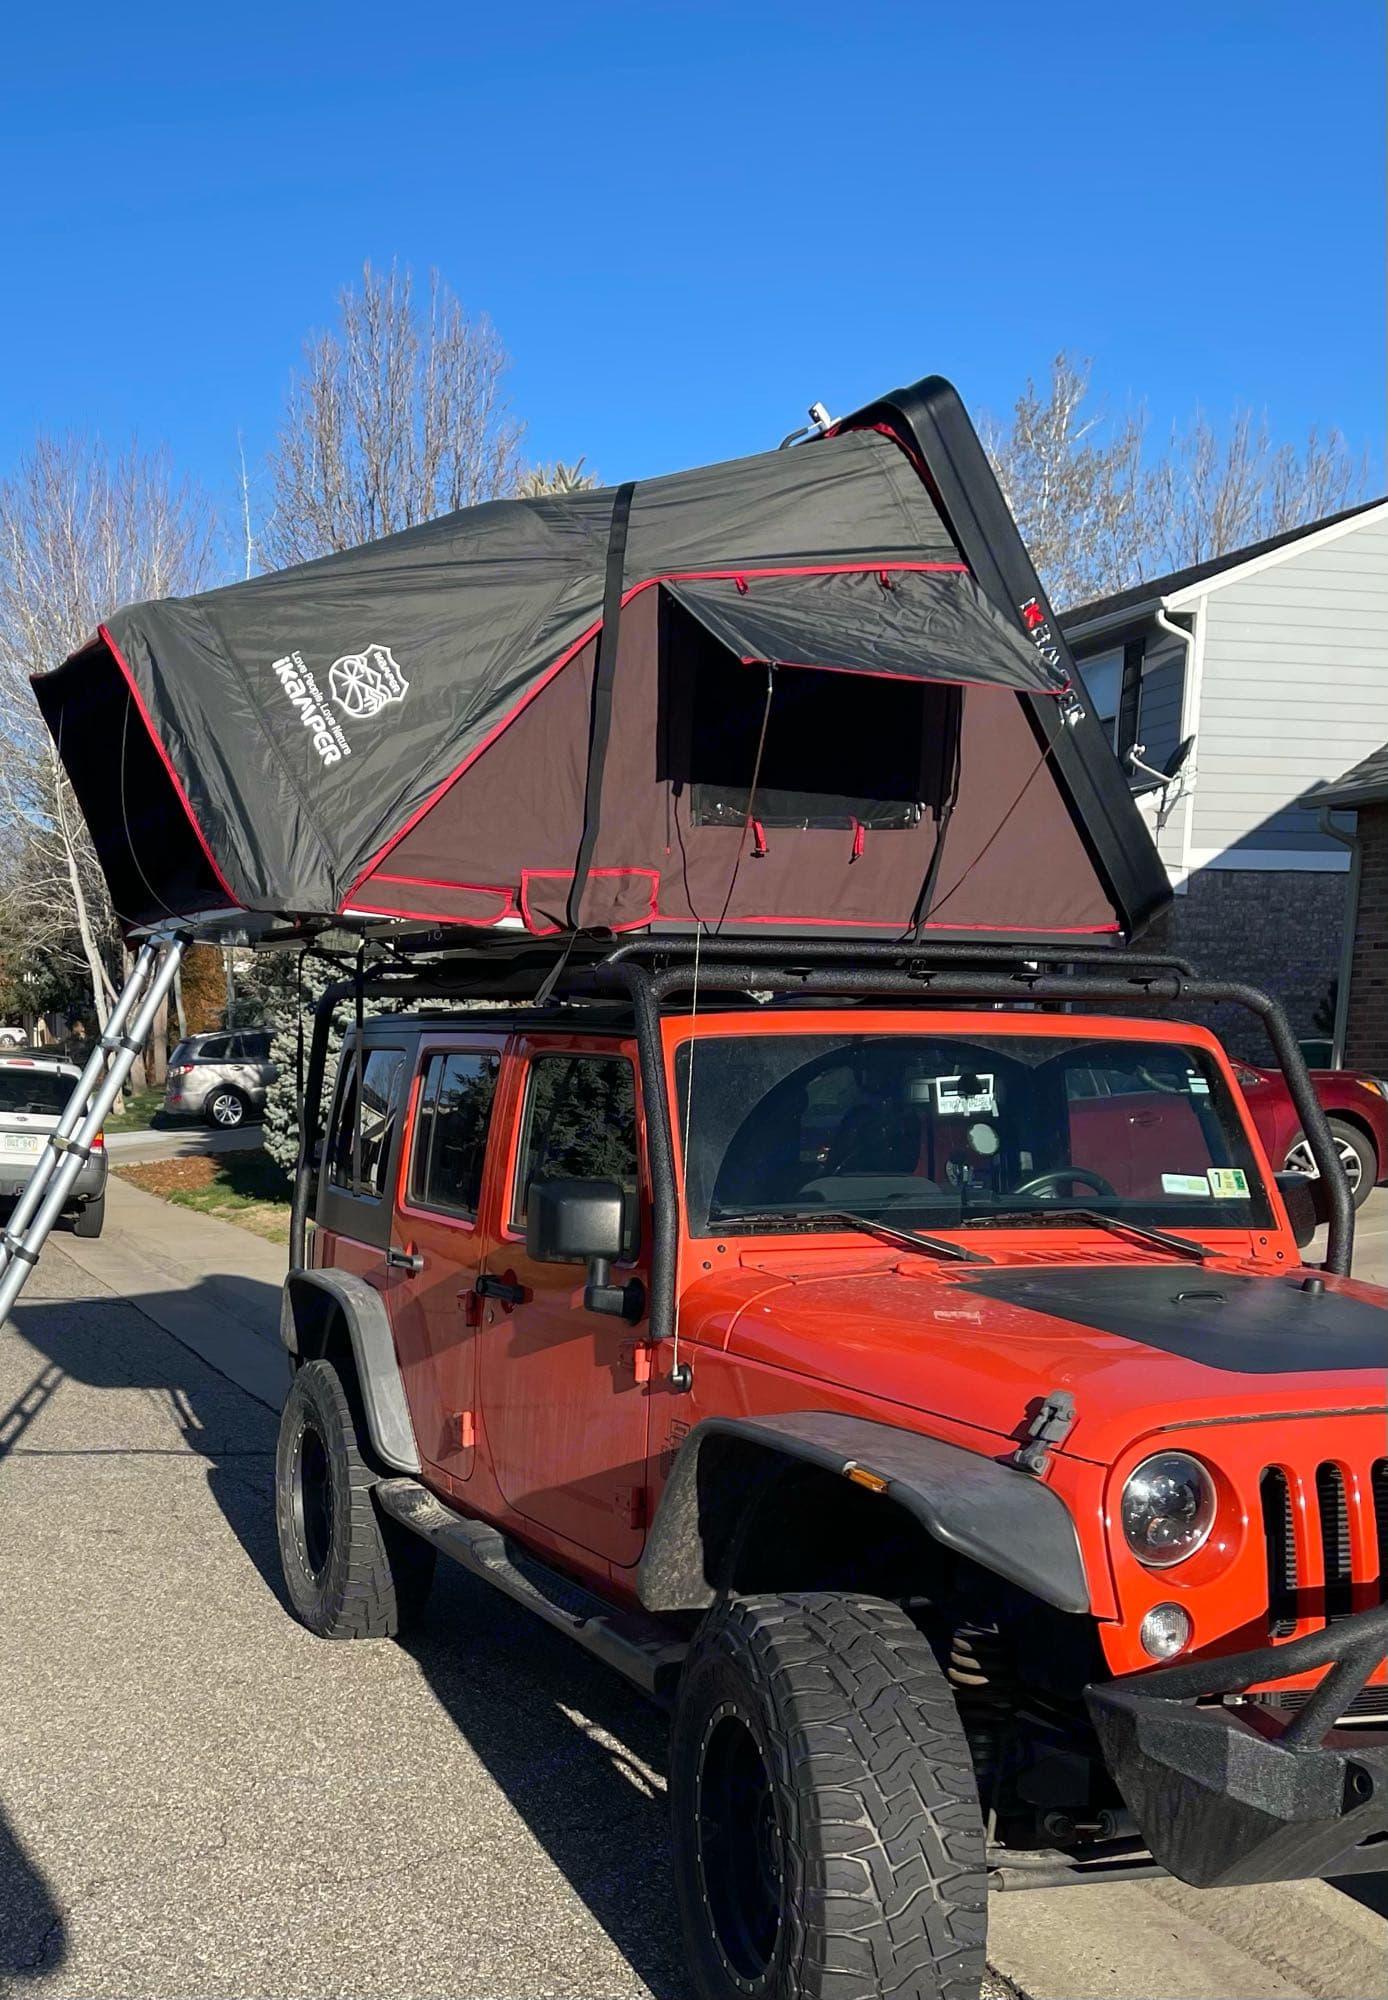 iKamper Skycamp 2.0 on Crush. Jeep Wrangler JKU Sport 4x4 2015